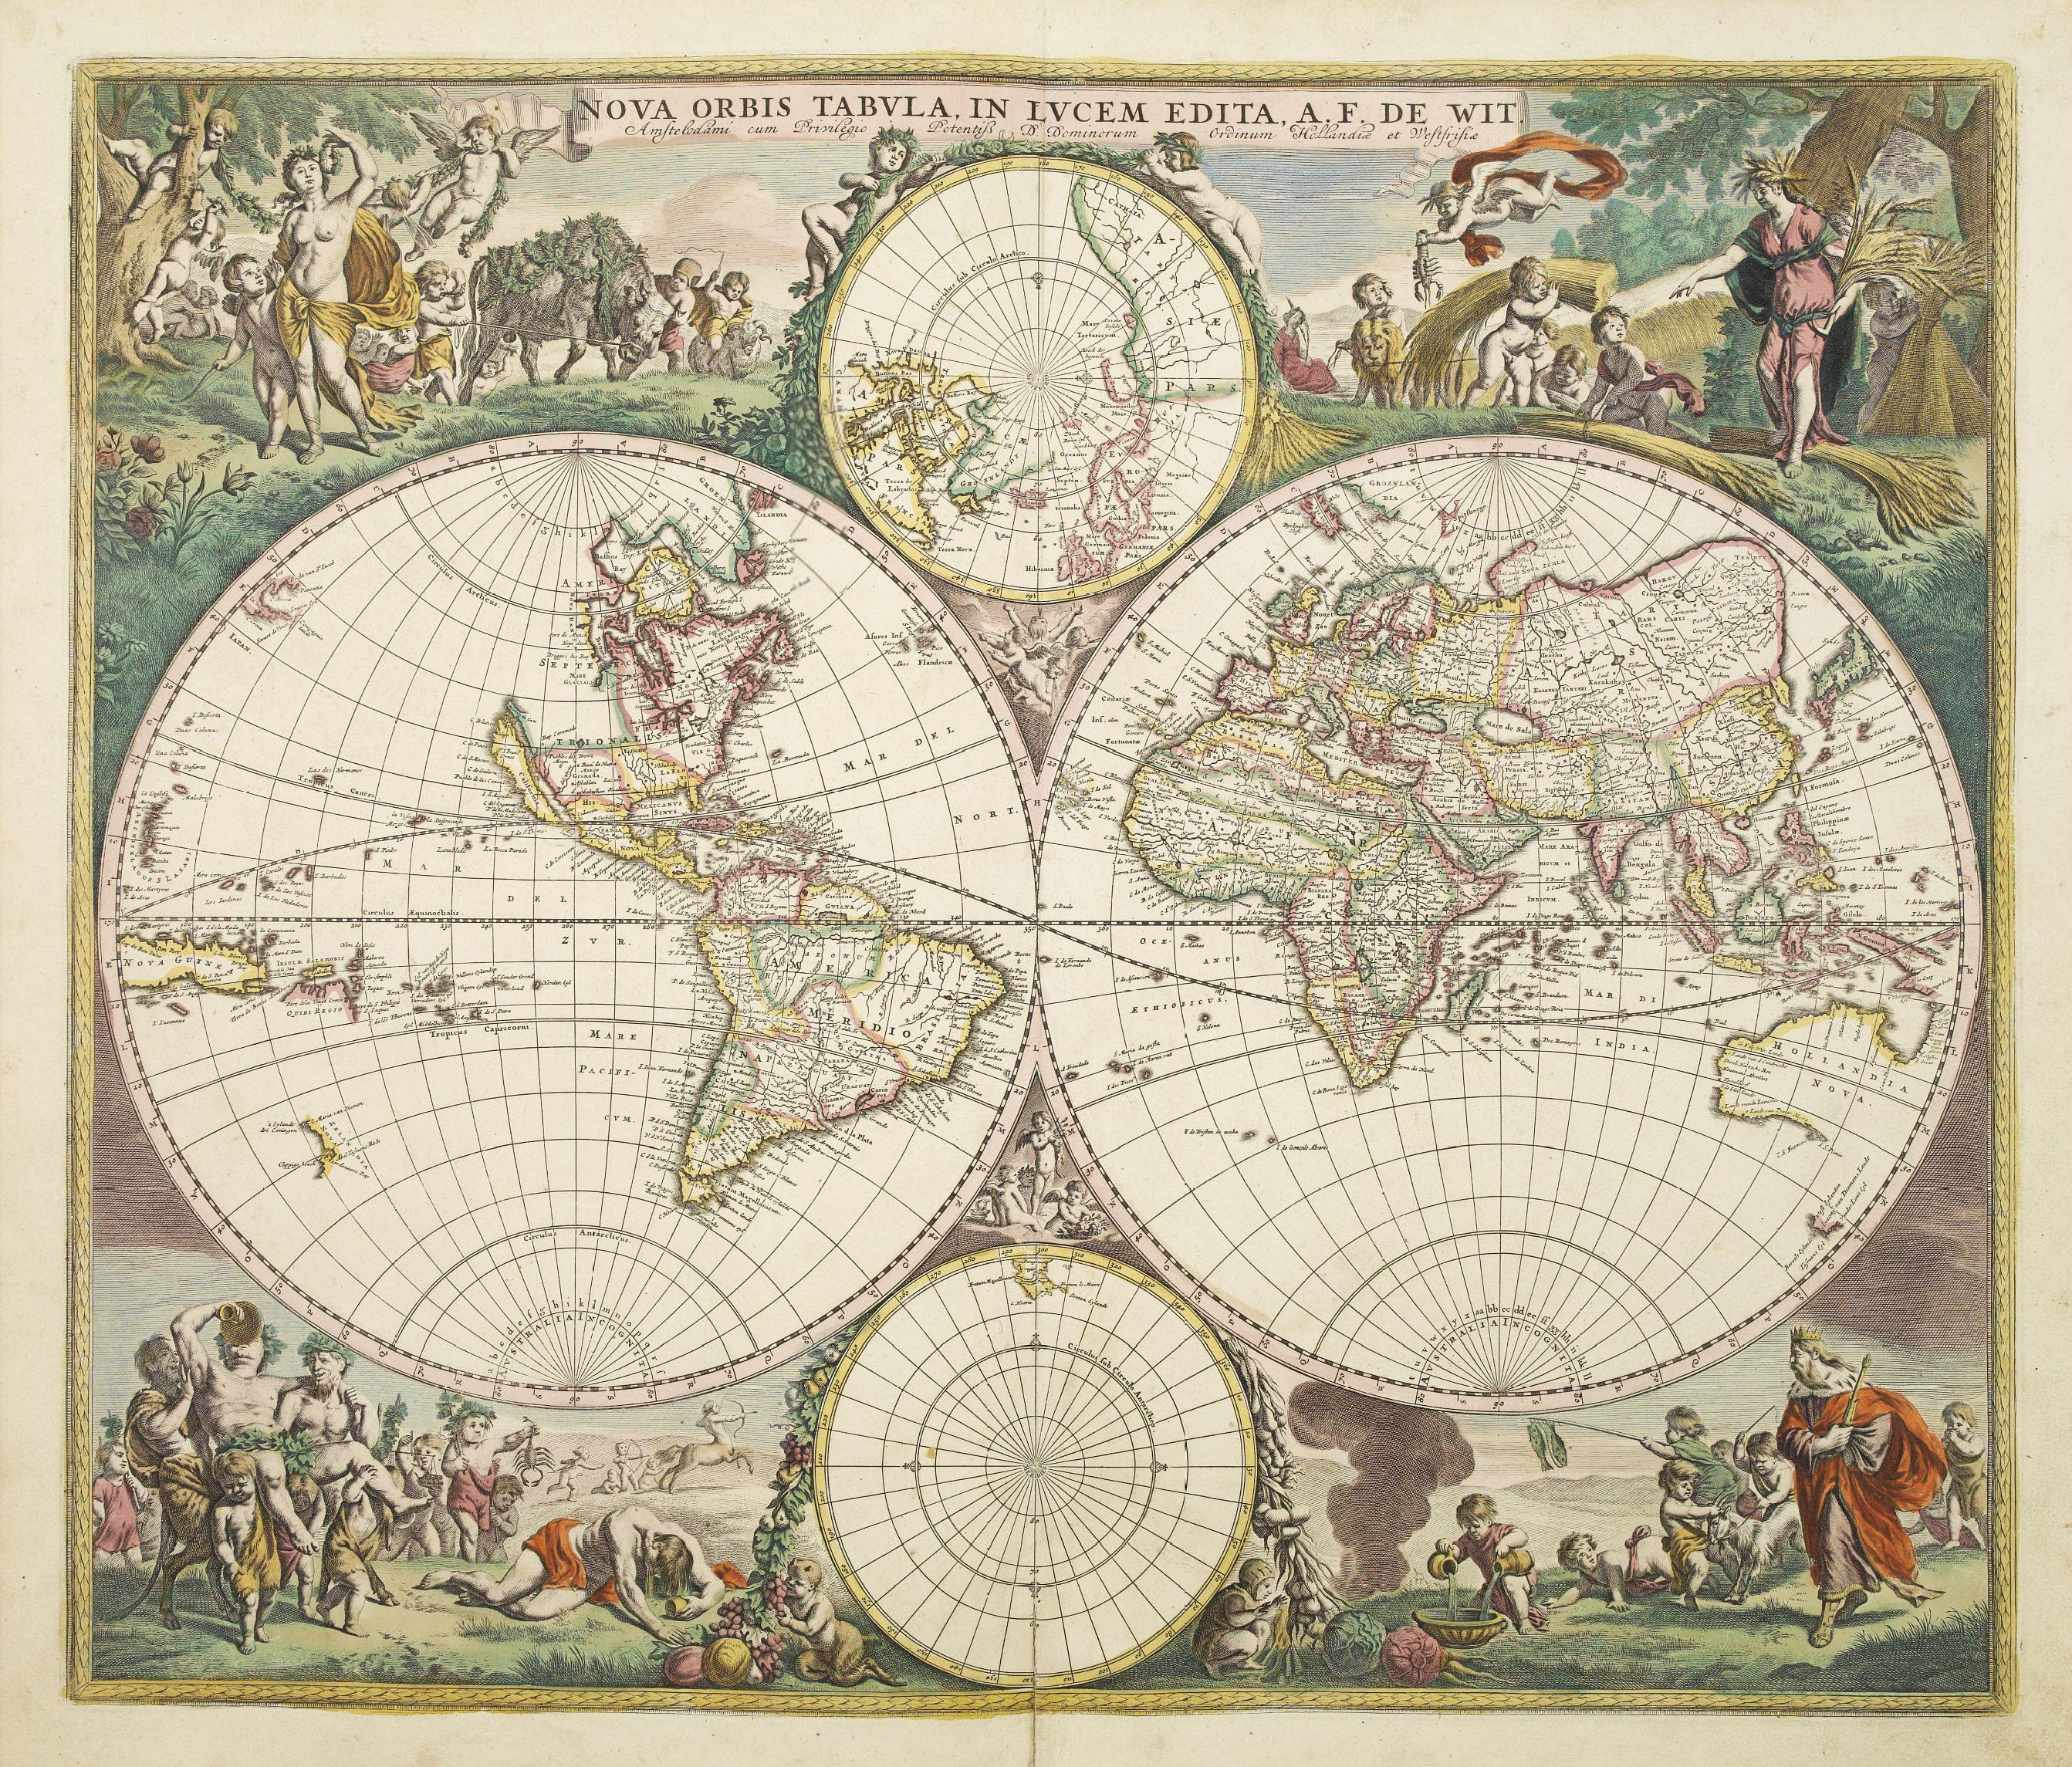 alt=Nova Orbis Tabula in Lucem edita A F de Wit 1680.jpg